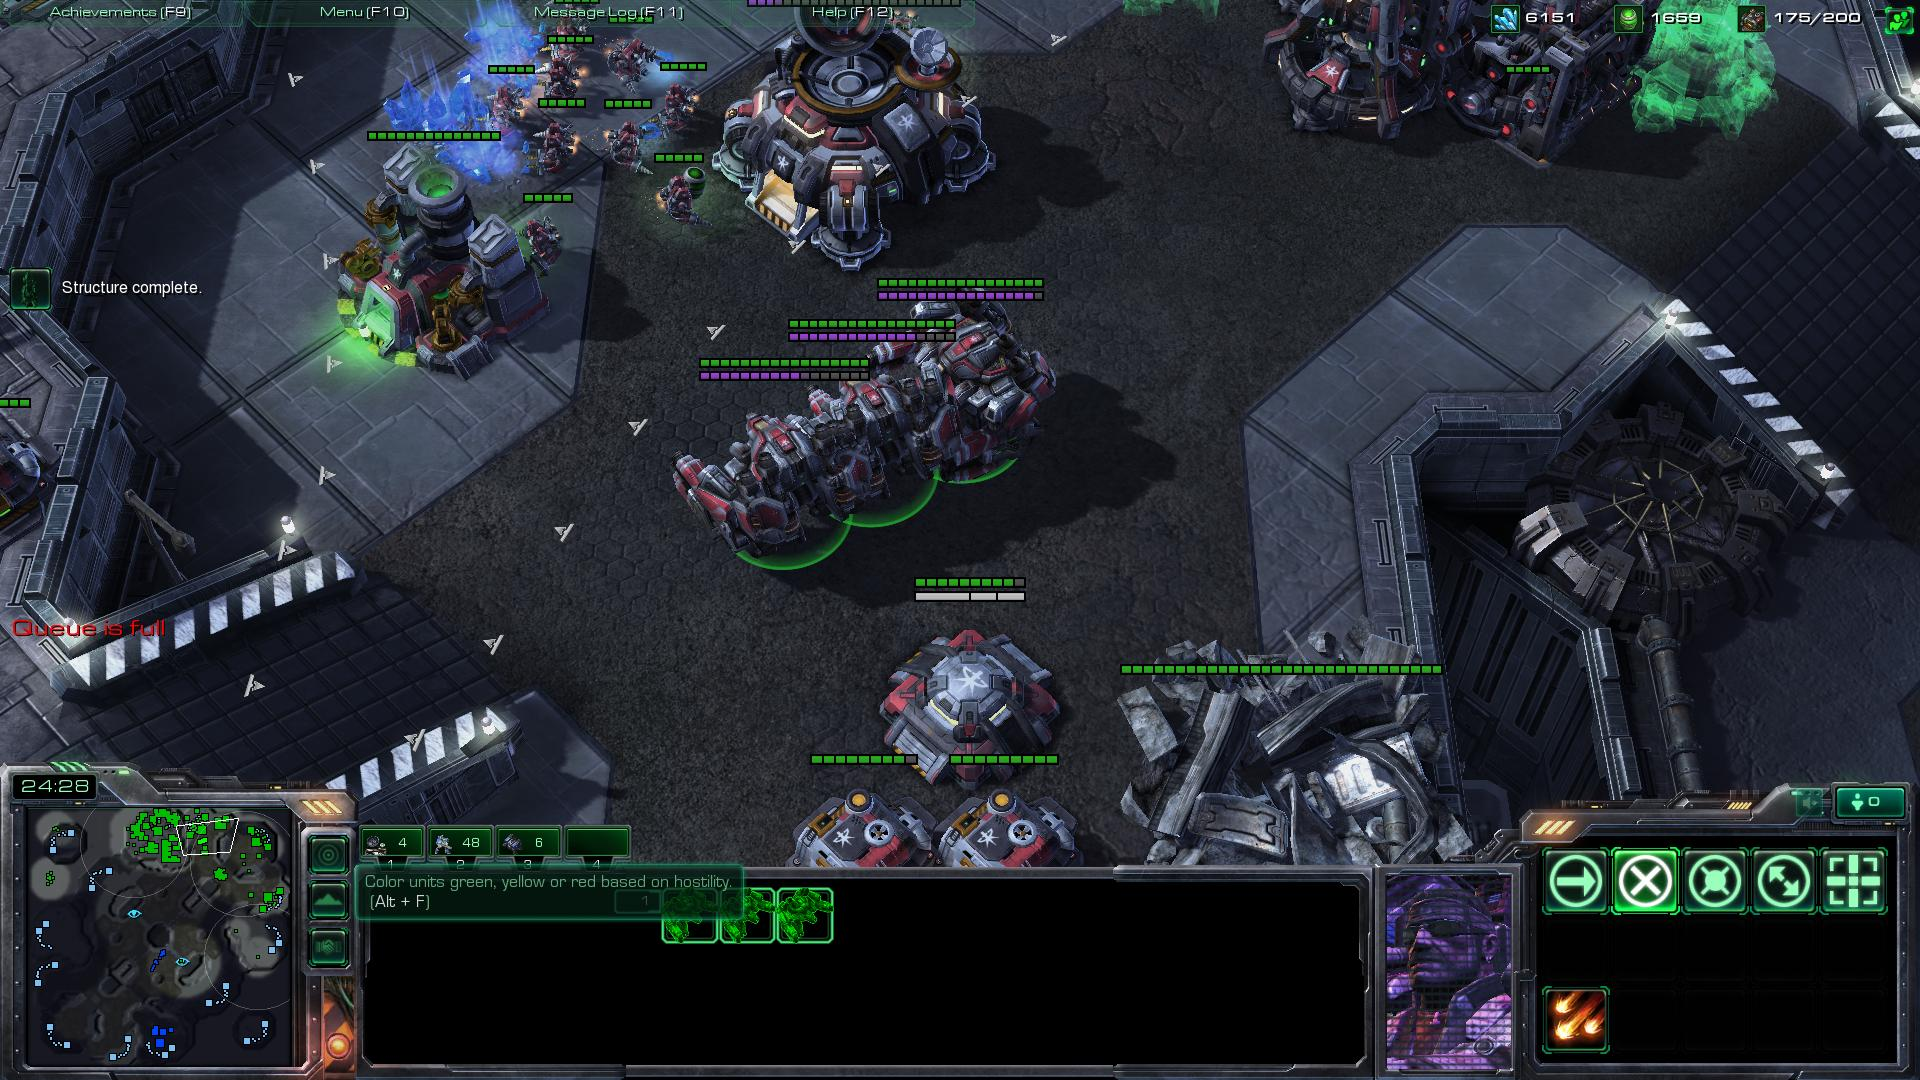 starcraft 2 terran build sc2 screenshot - Gamingcfg com